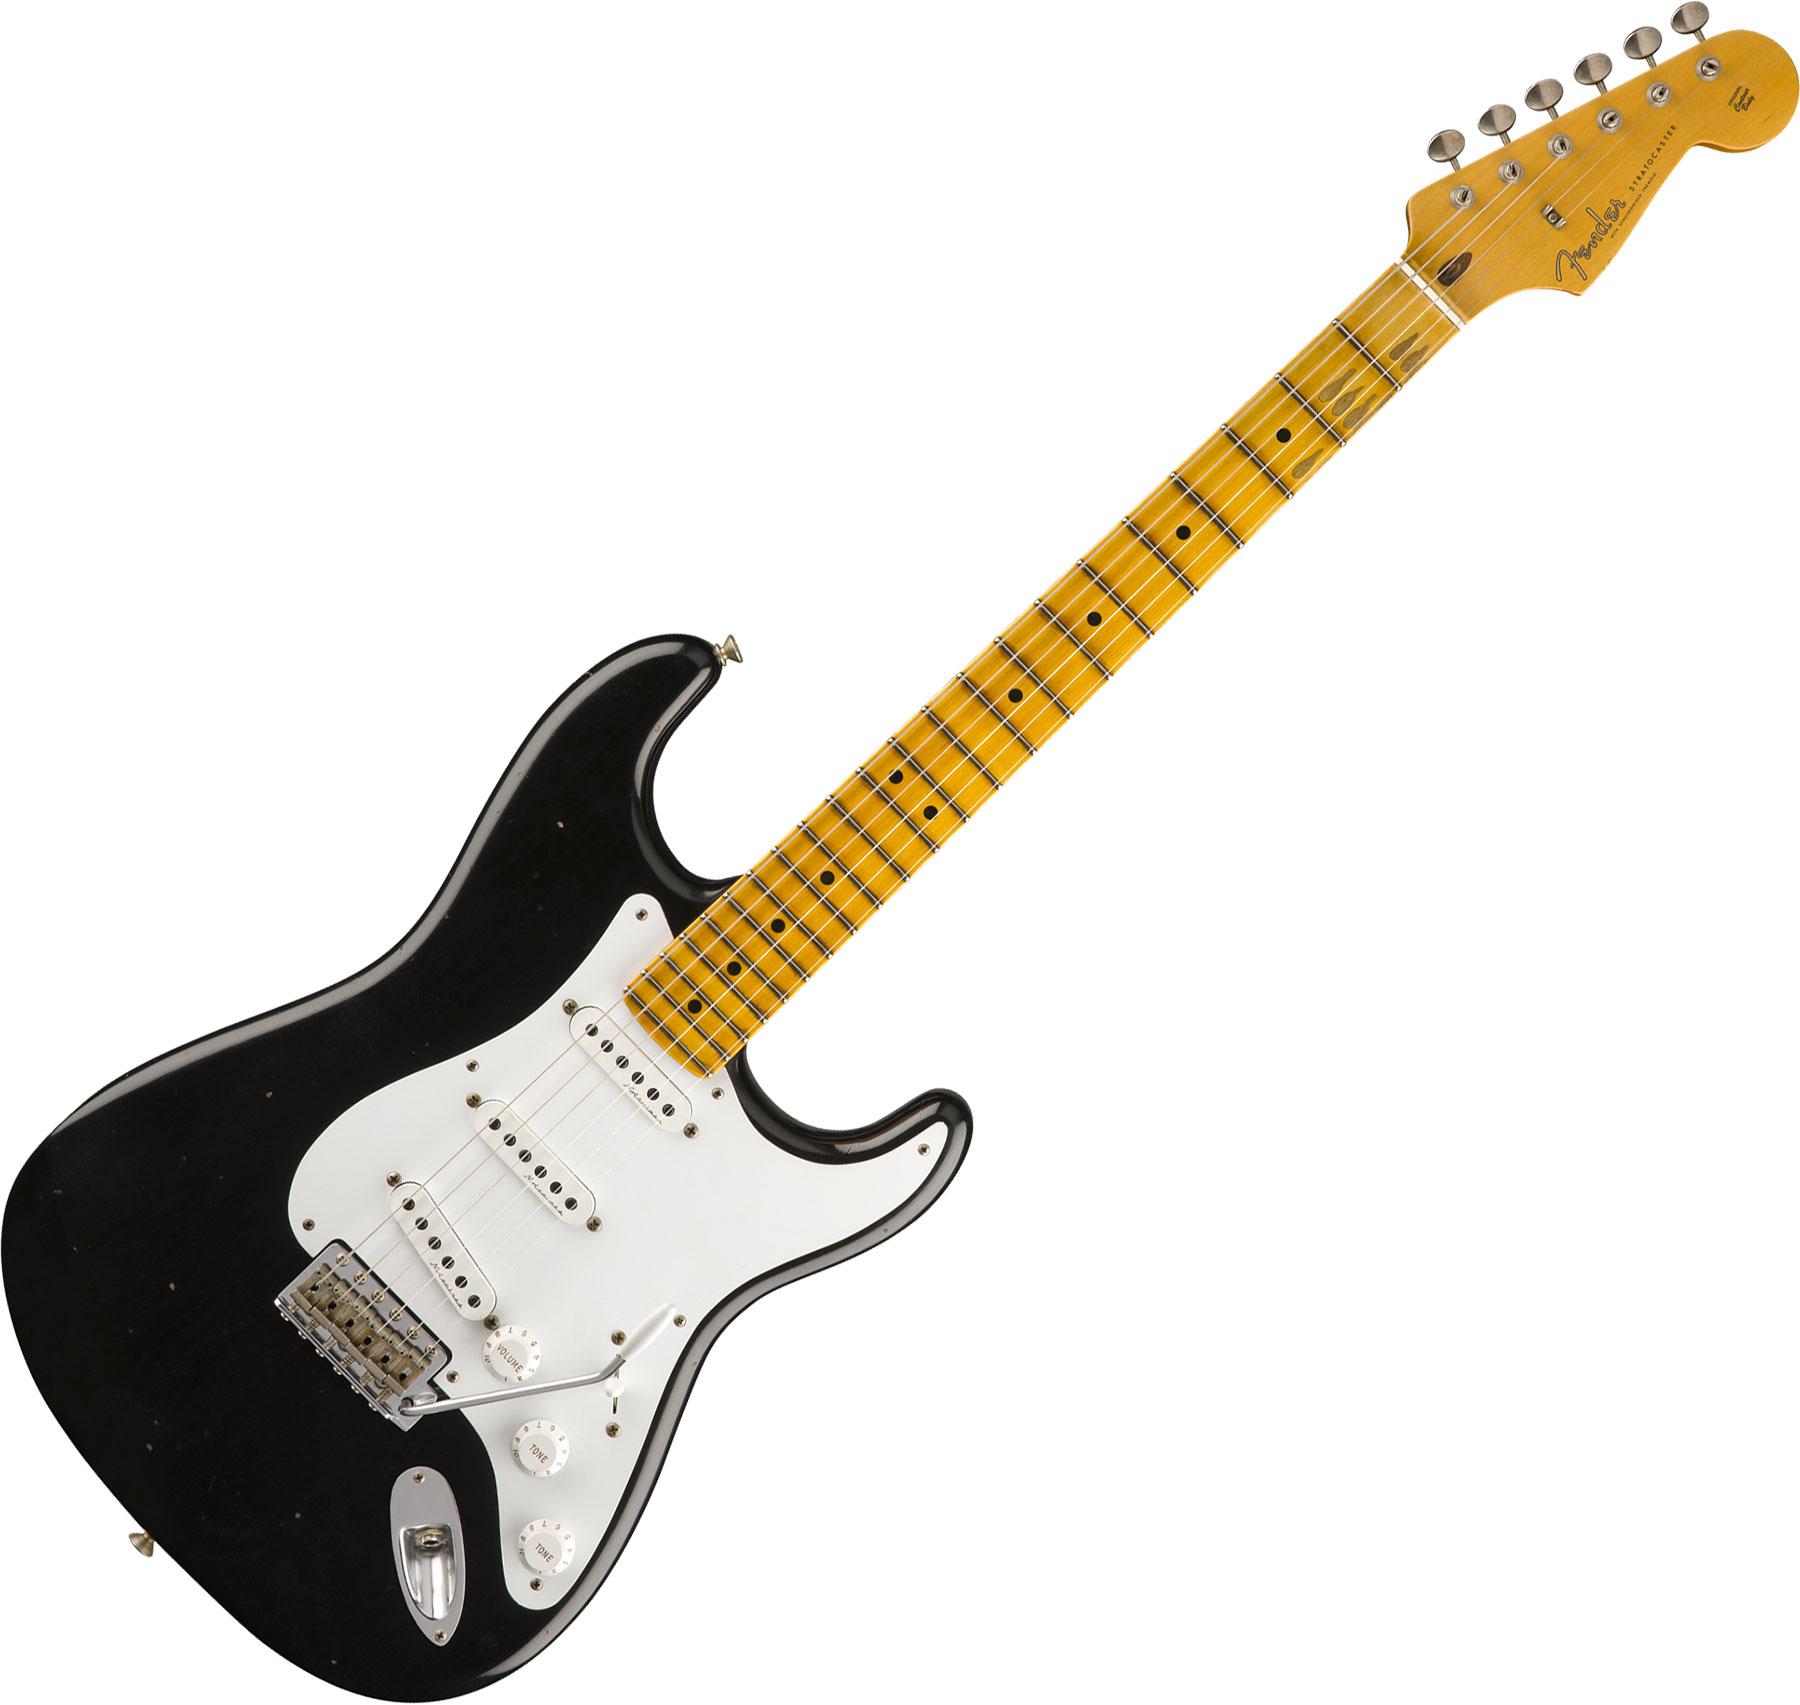 2005 Zemaitis Custom Acoustic In Natural Finish Bonhams Auction 19226 Lot 14 2008 Fender Stratocaster Eric Clapton Signature Model Serial No